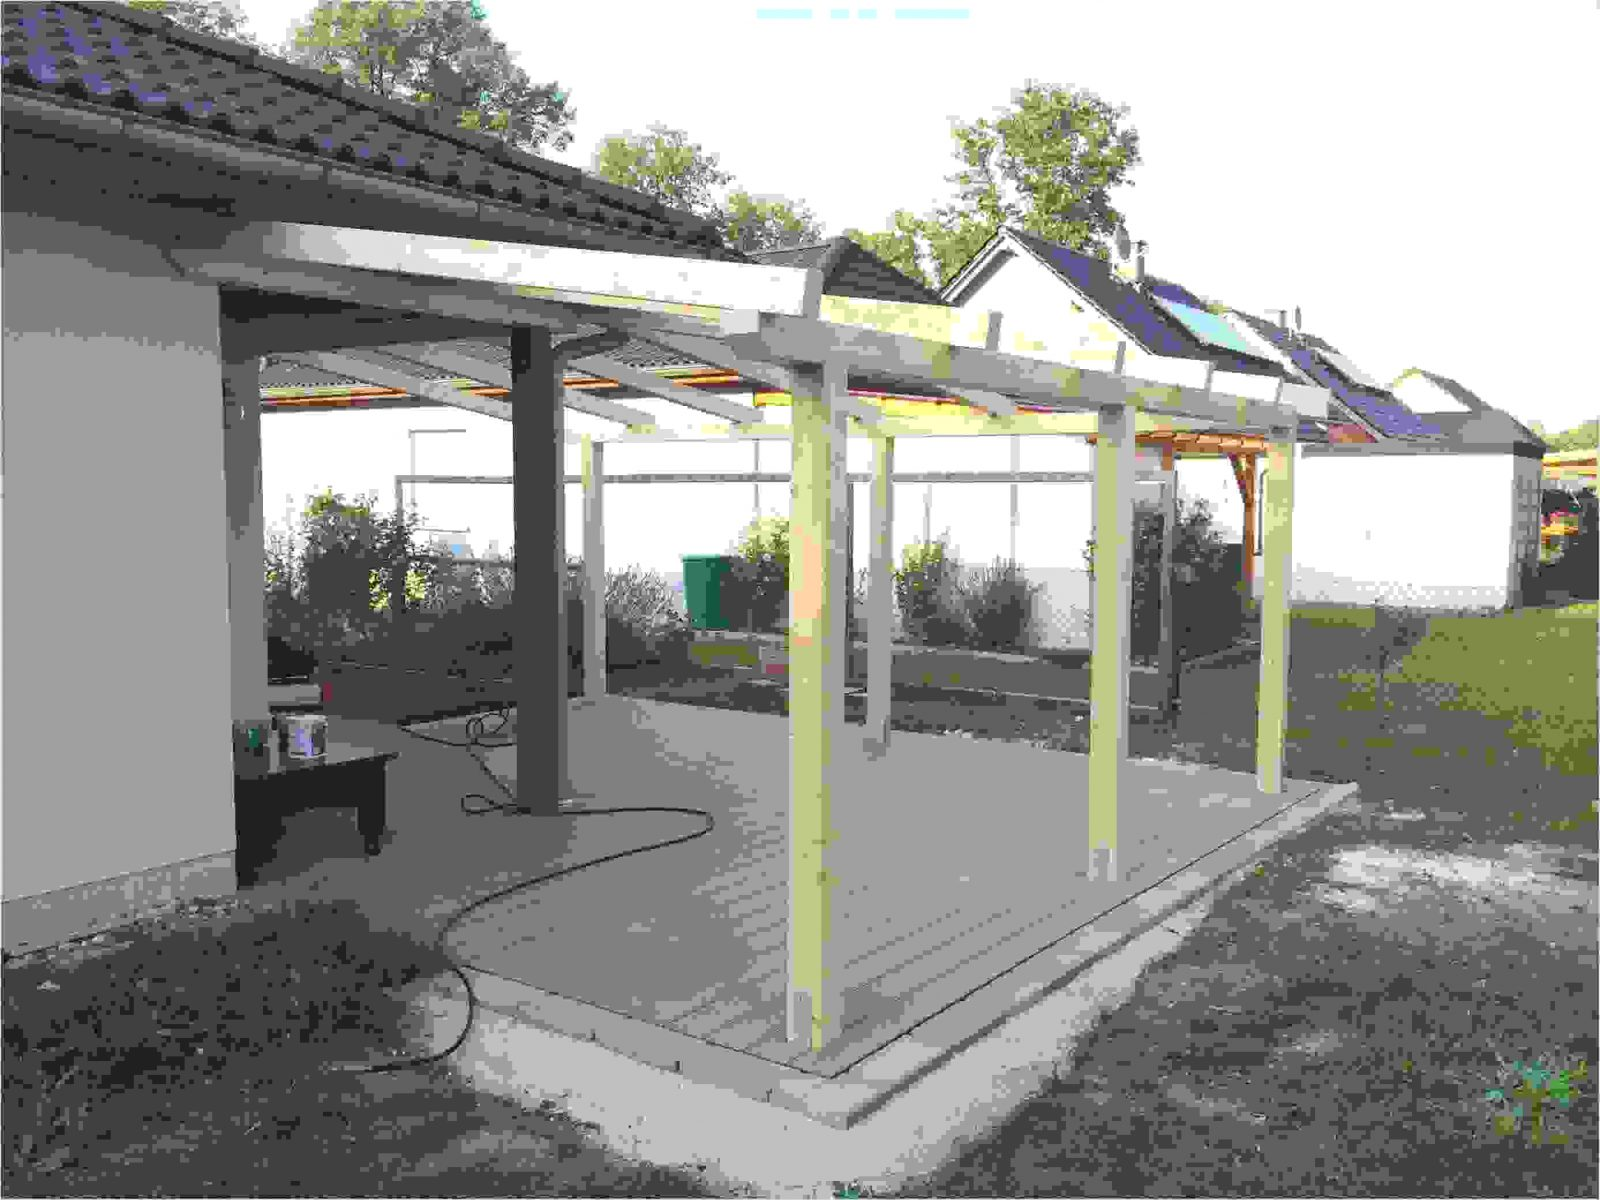 Terrassenüberdachung Aluminium Selber Bauen Ist Luxus Konzept Von von Terrassenüberdachung Freistehend Selber Bauen Bild